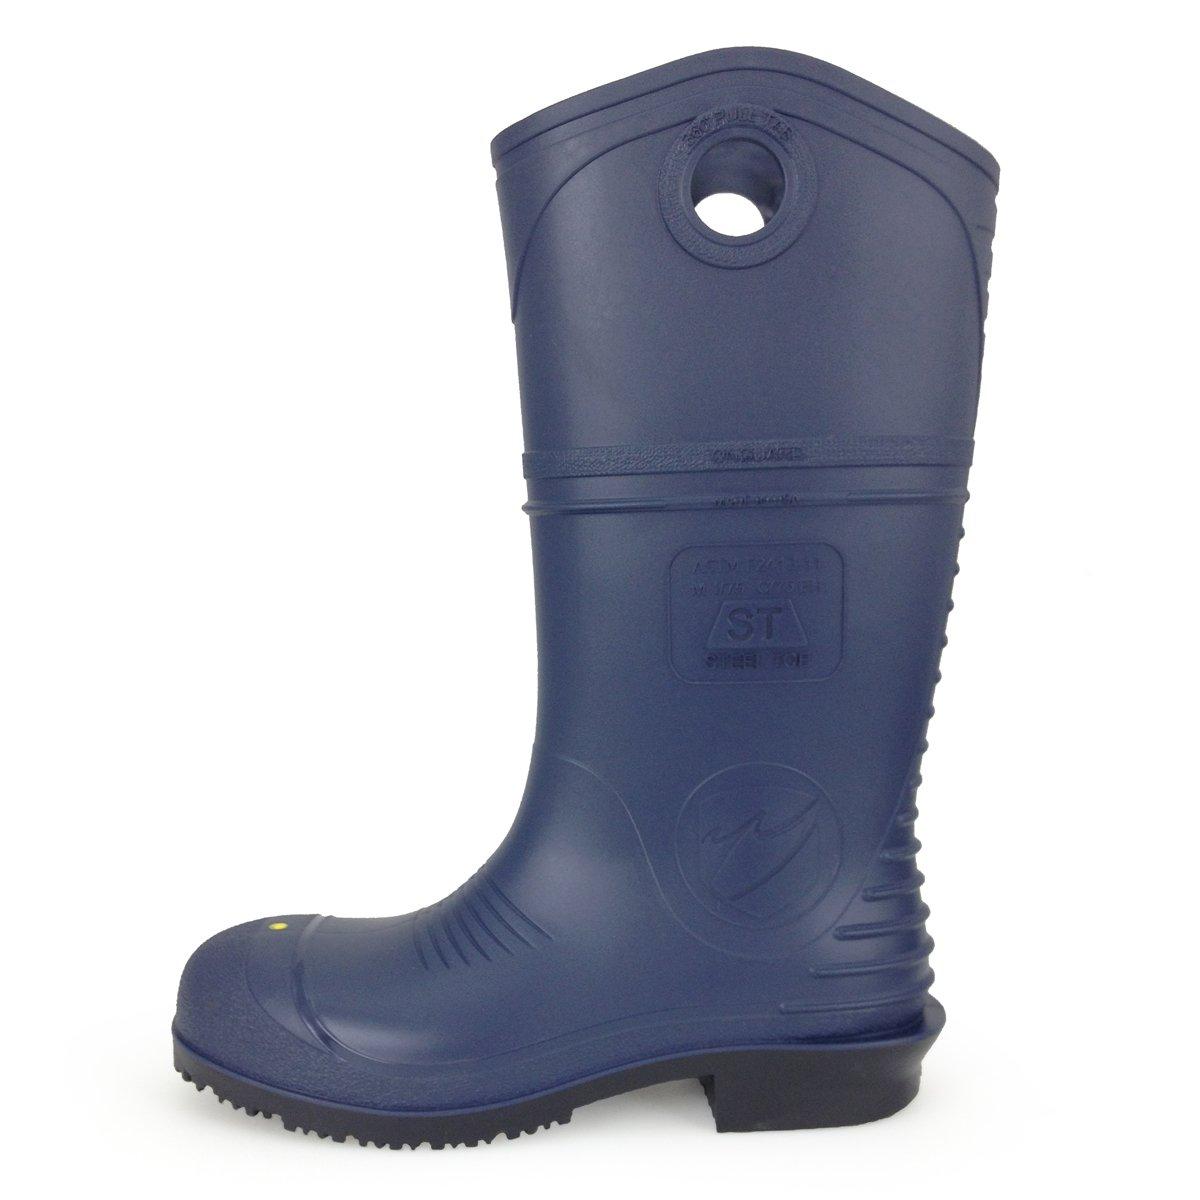 UltraSource 440037-5 DuraPro PVC Boots, 15'', Blue, Steel Toe, Size 5 (Pair)